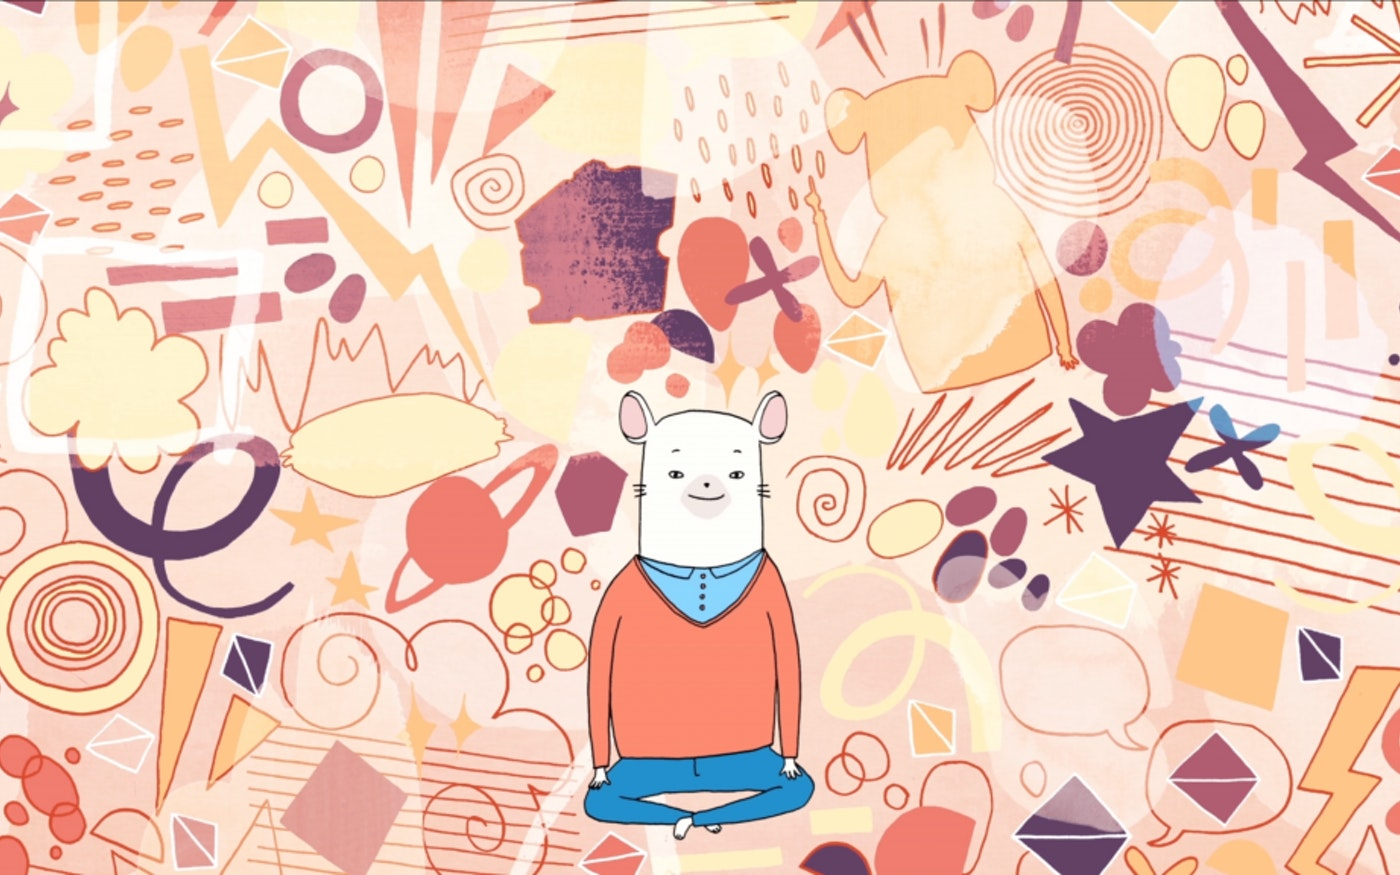 Image:  Meditation 101: A Beginner's Guide